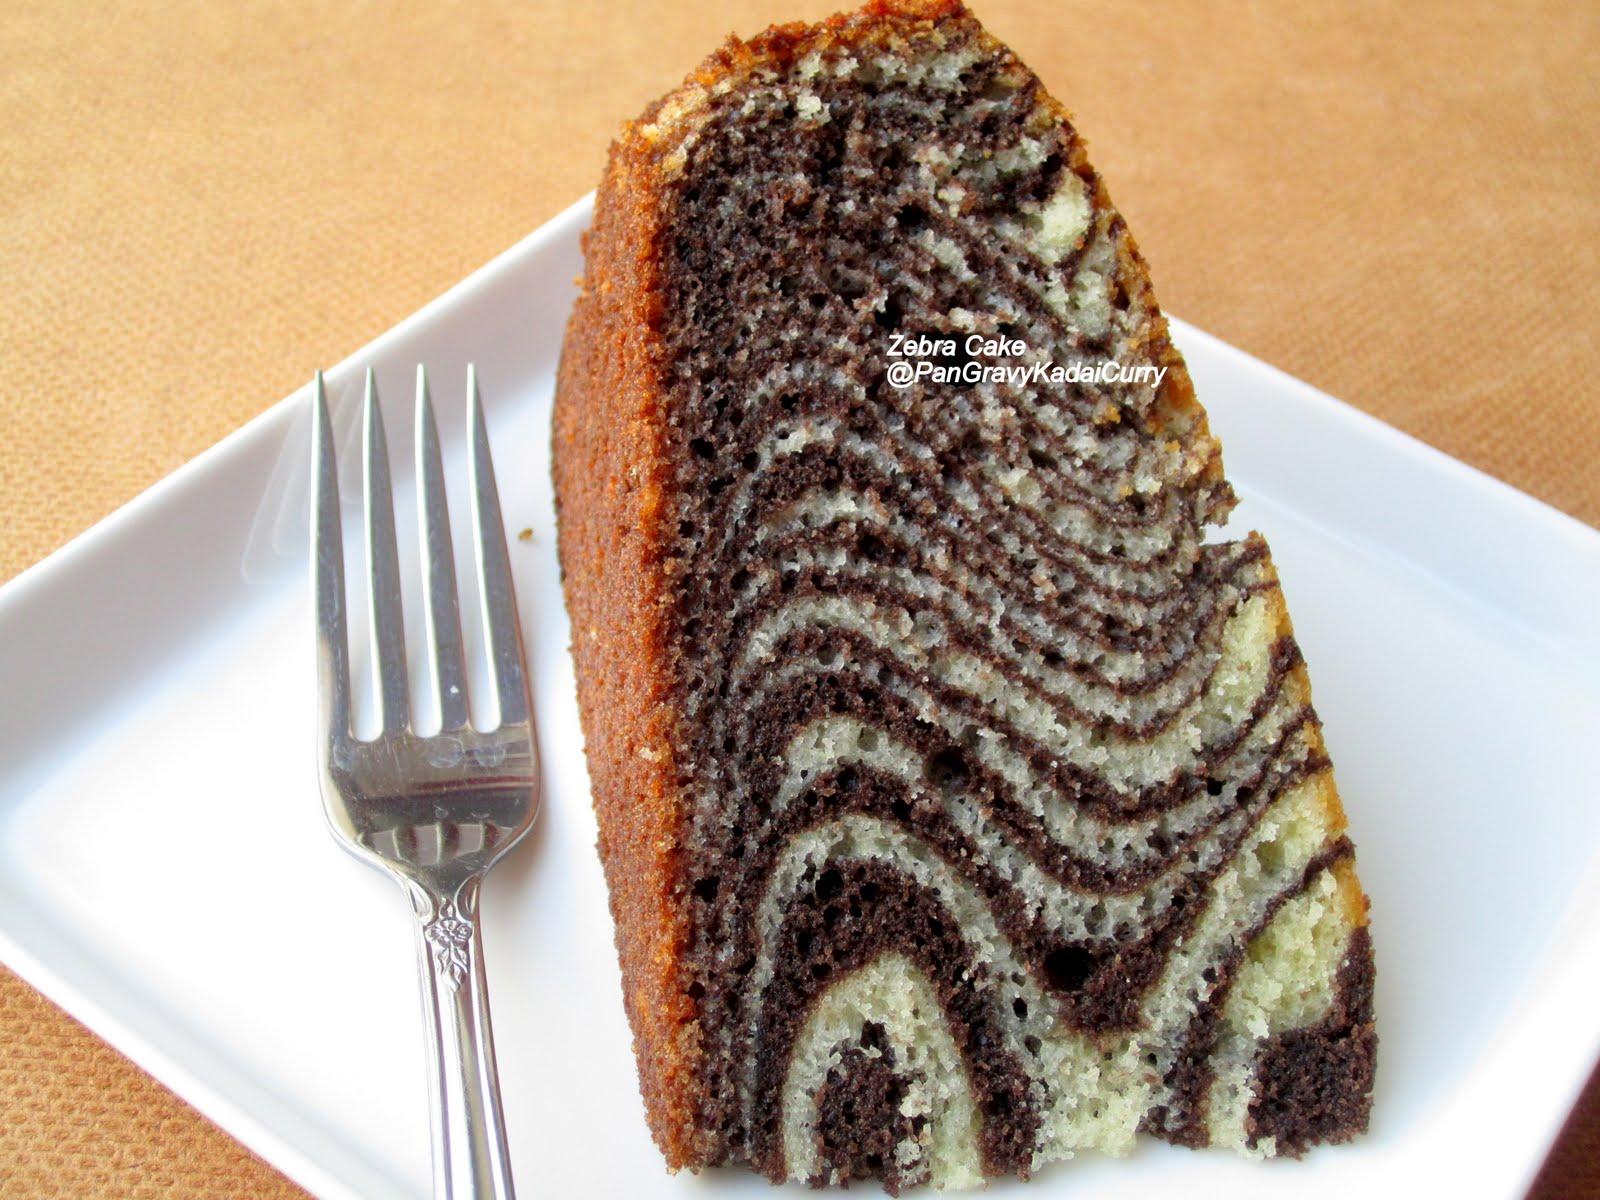 Egg Cake Recipe In Kadai: Pan Gravy Kadai Curry: Zebra Cake